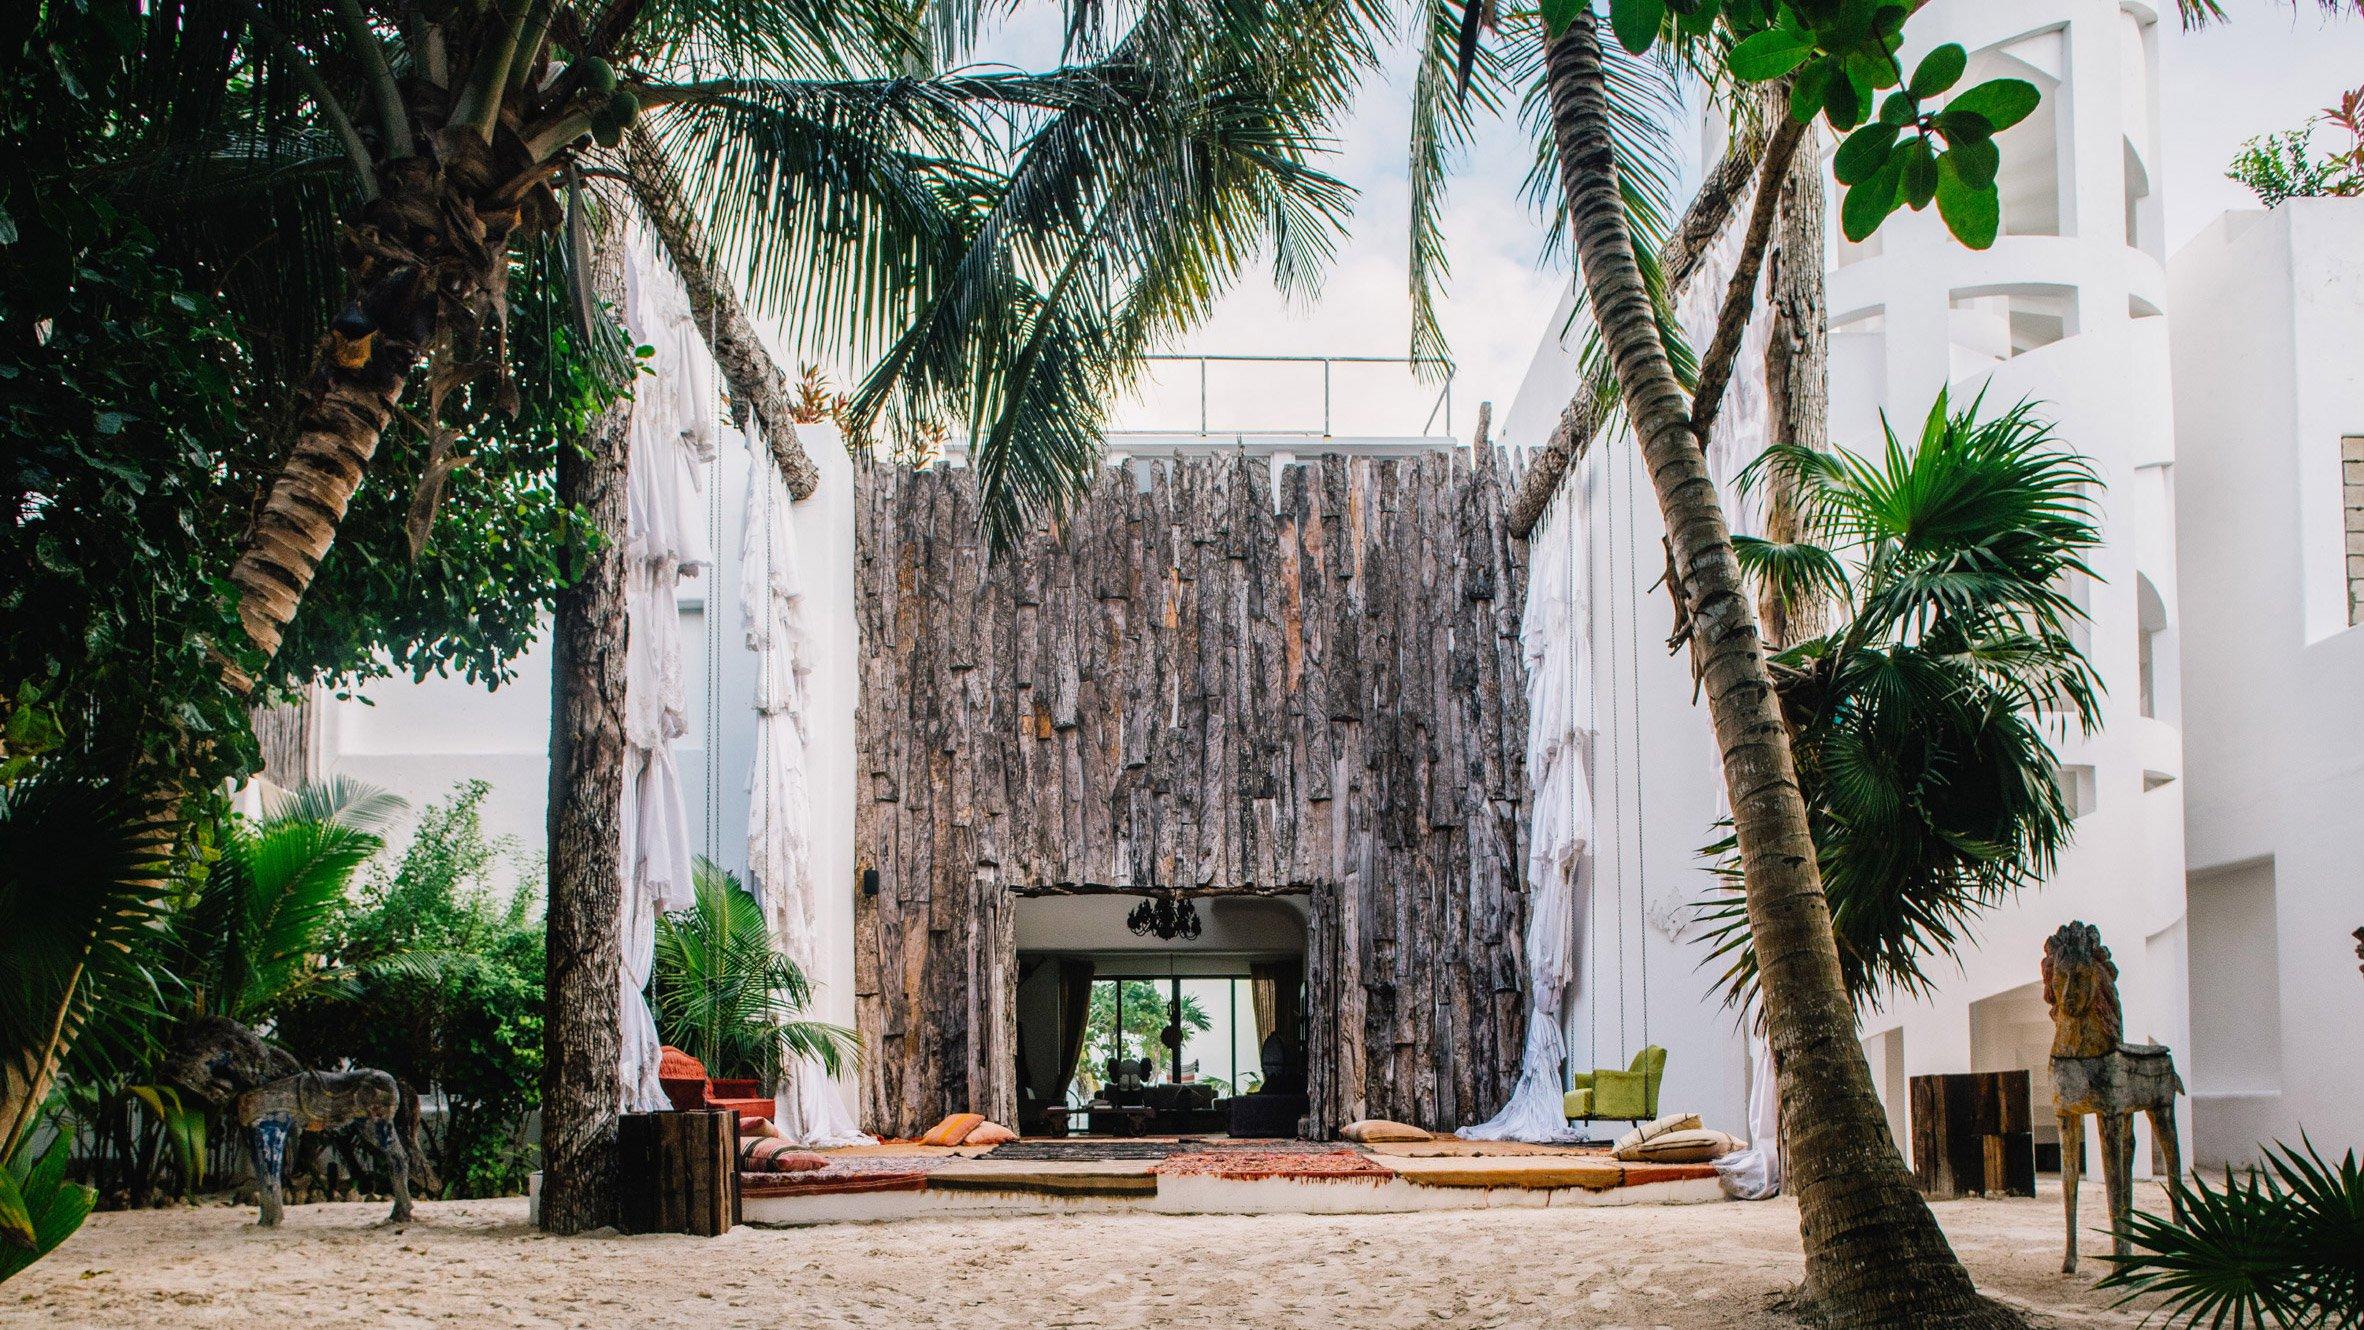 casa-malca-architecture-hotels-mexico_dezeen_hero-a.jpg